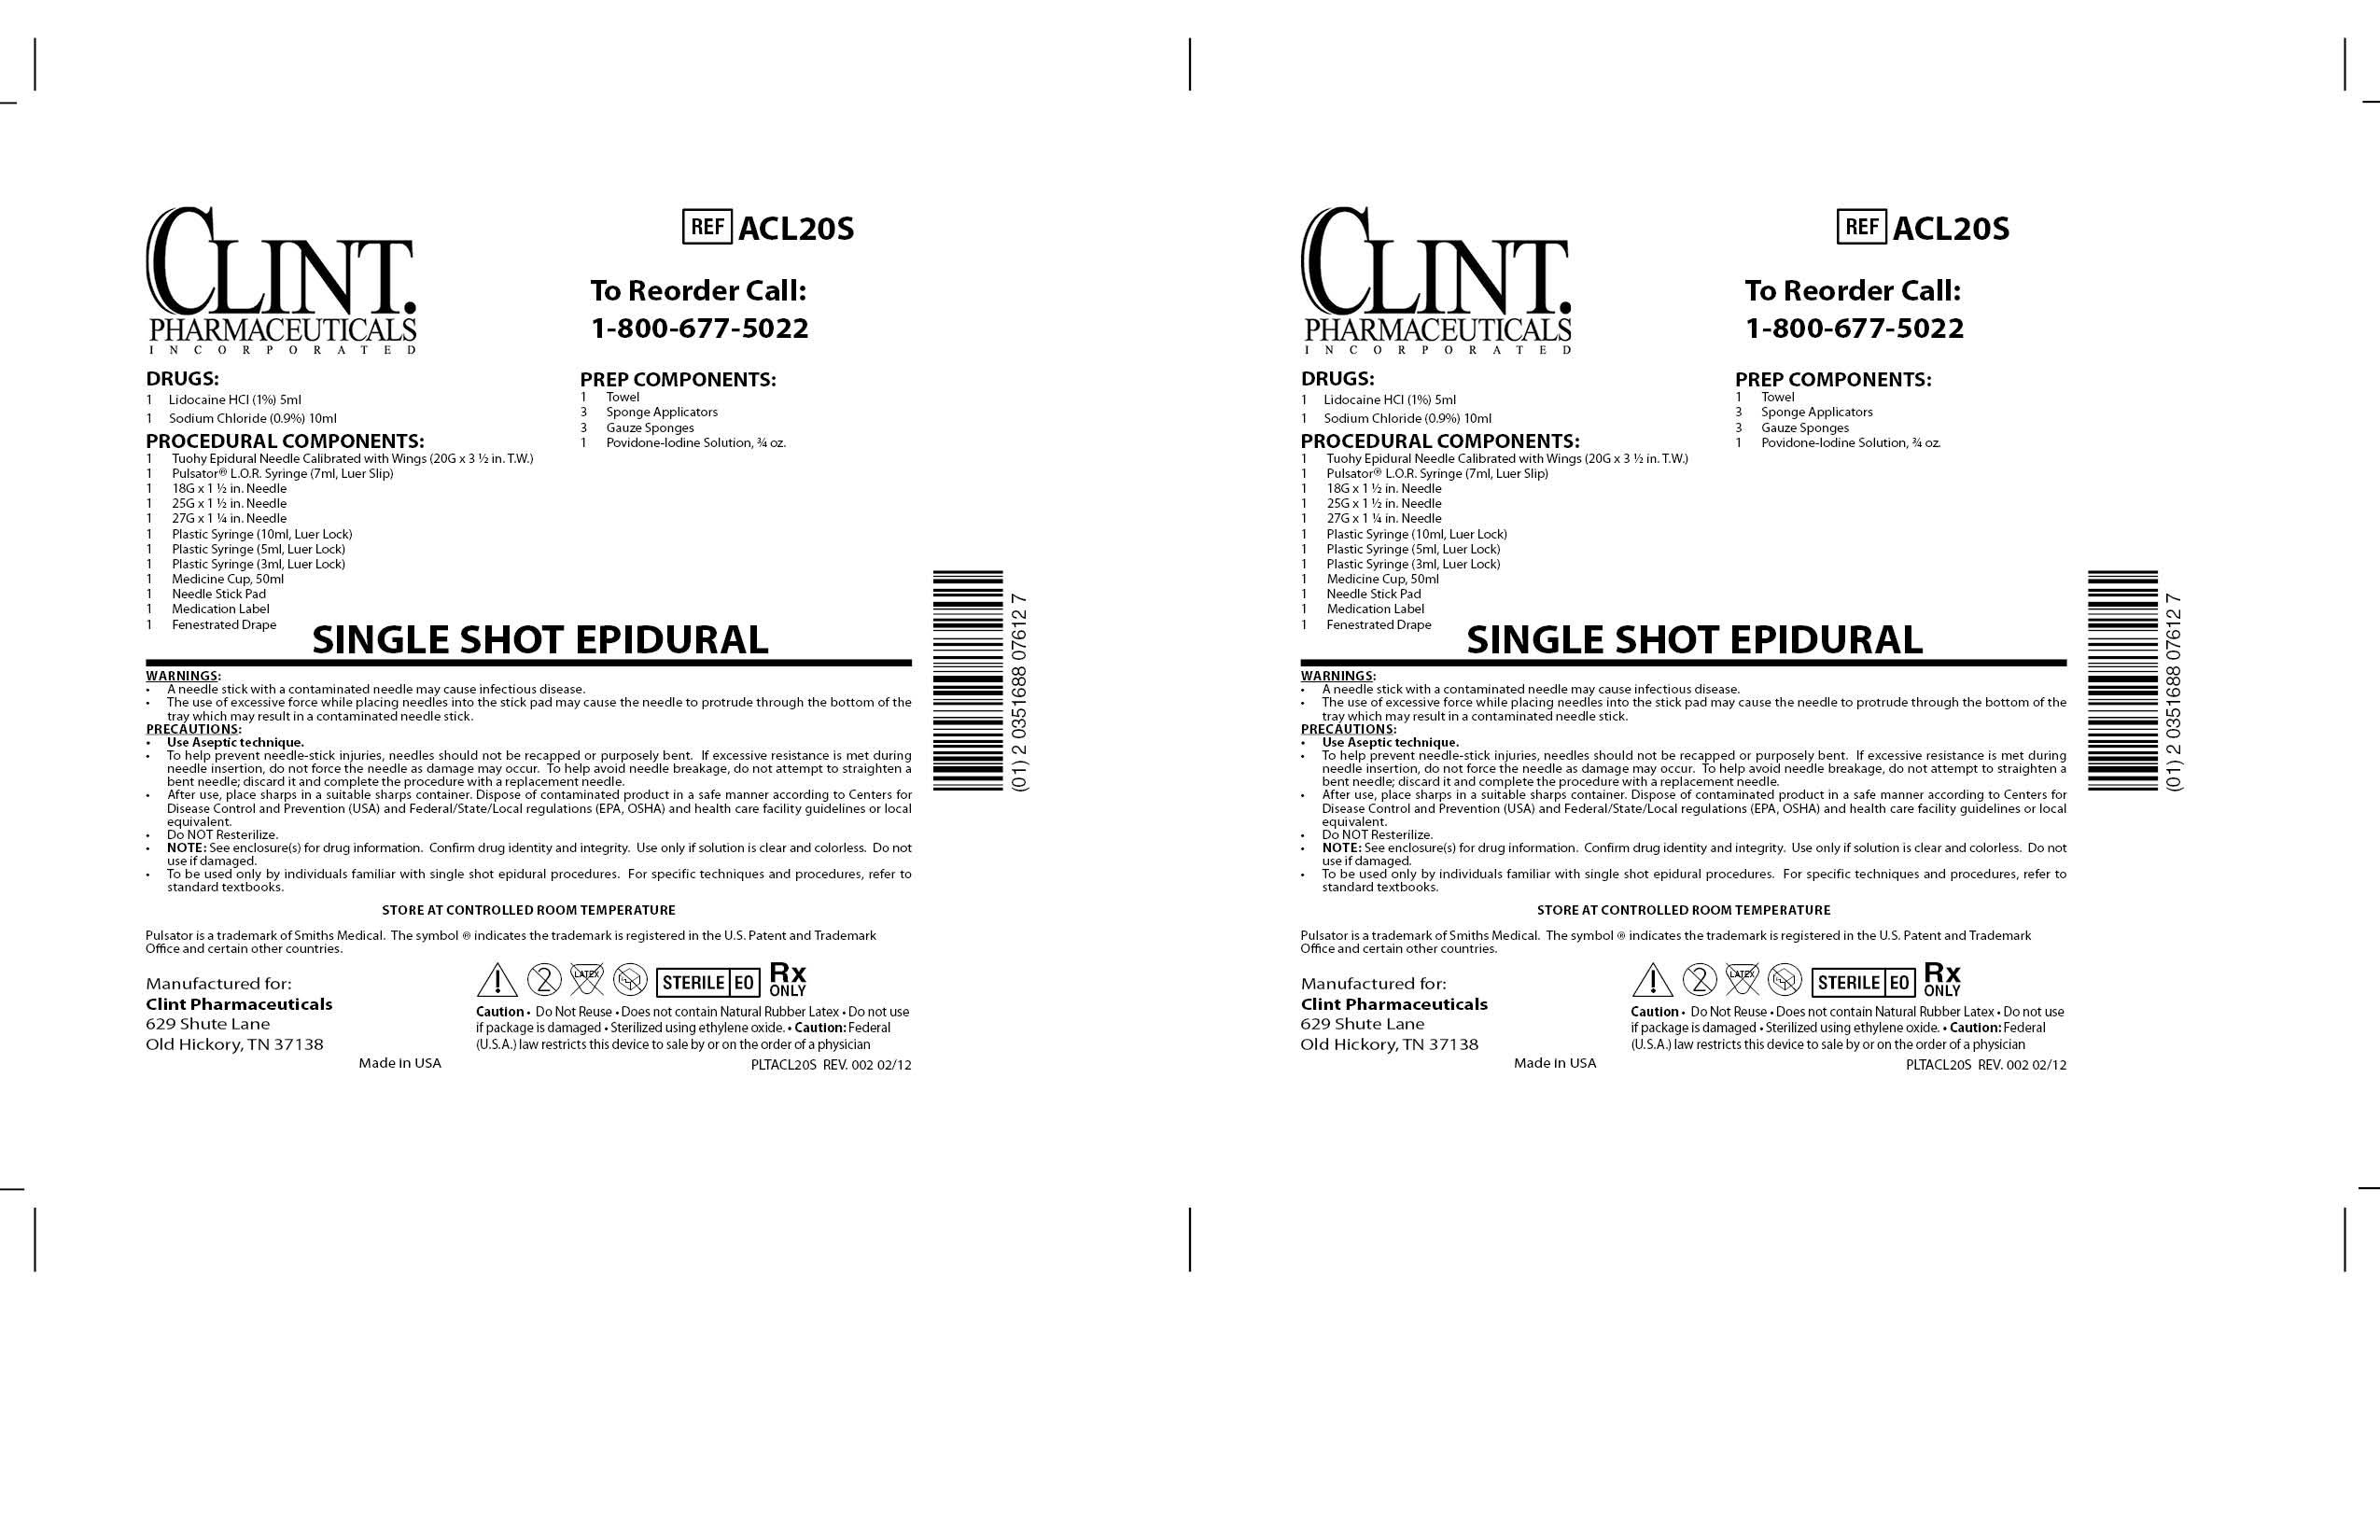 Acl20s Single Shot Epidural () Kit [Clint Pharmaceuticals, Inc.]